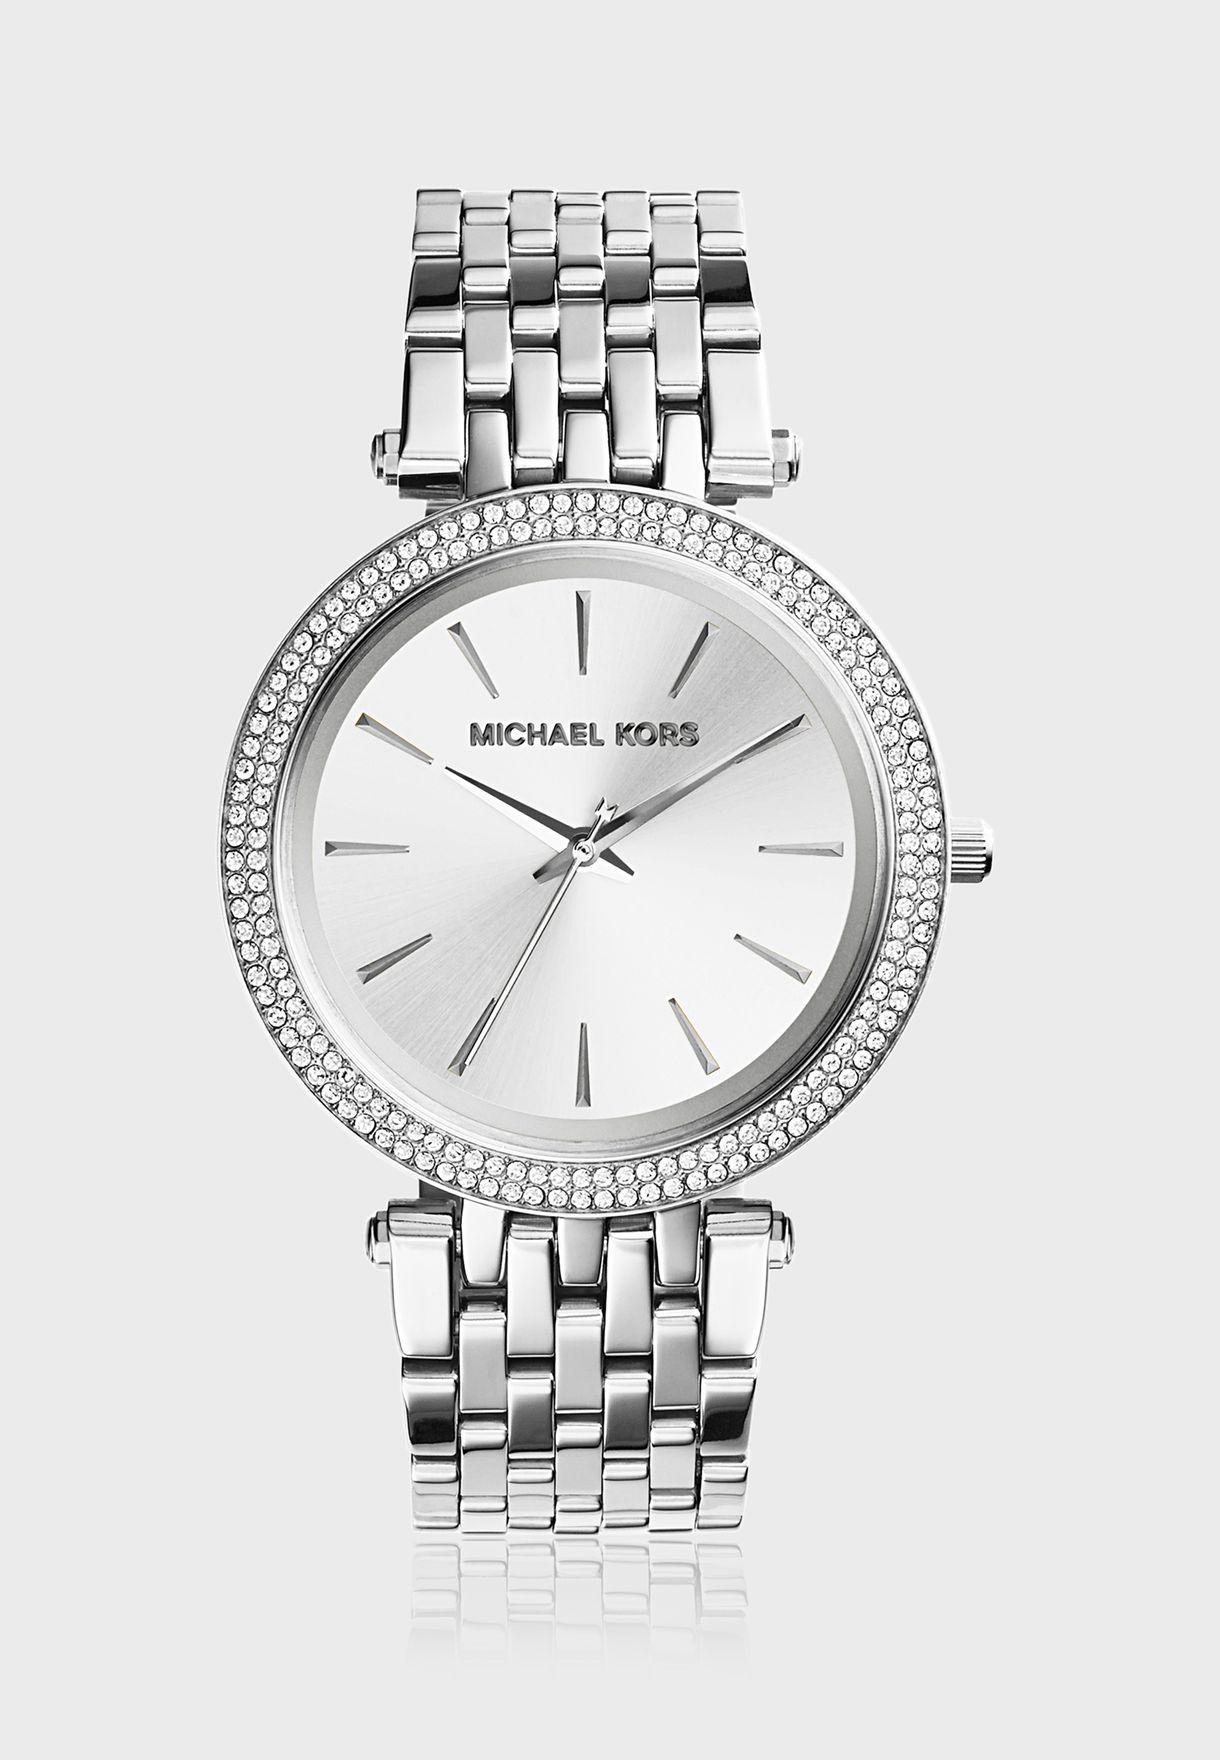 ساعة دارسي